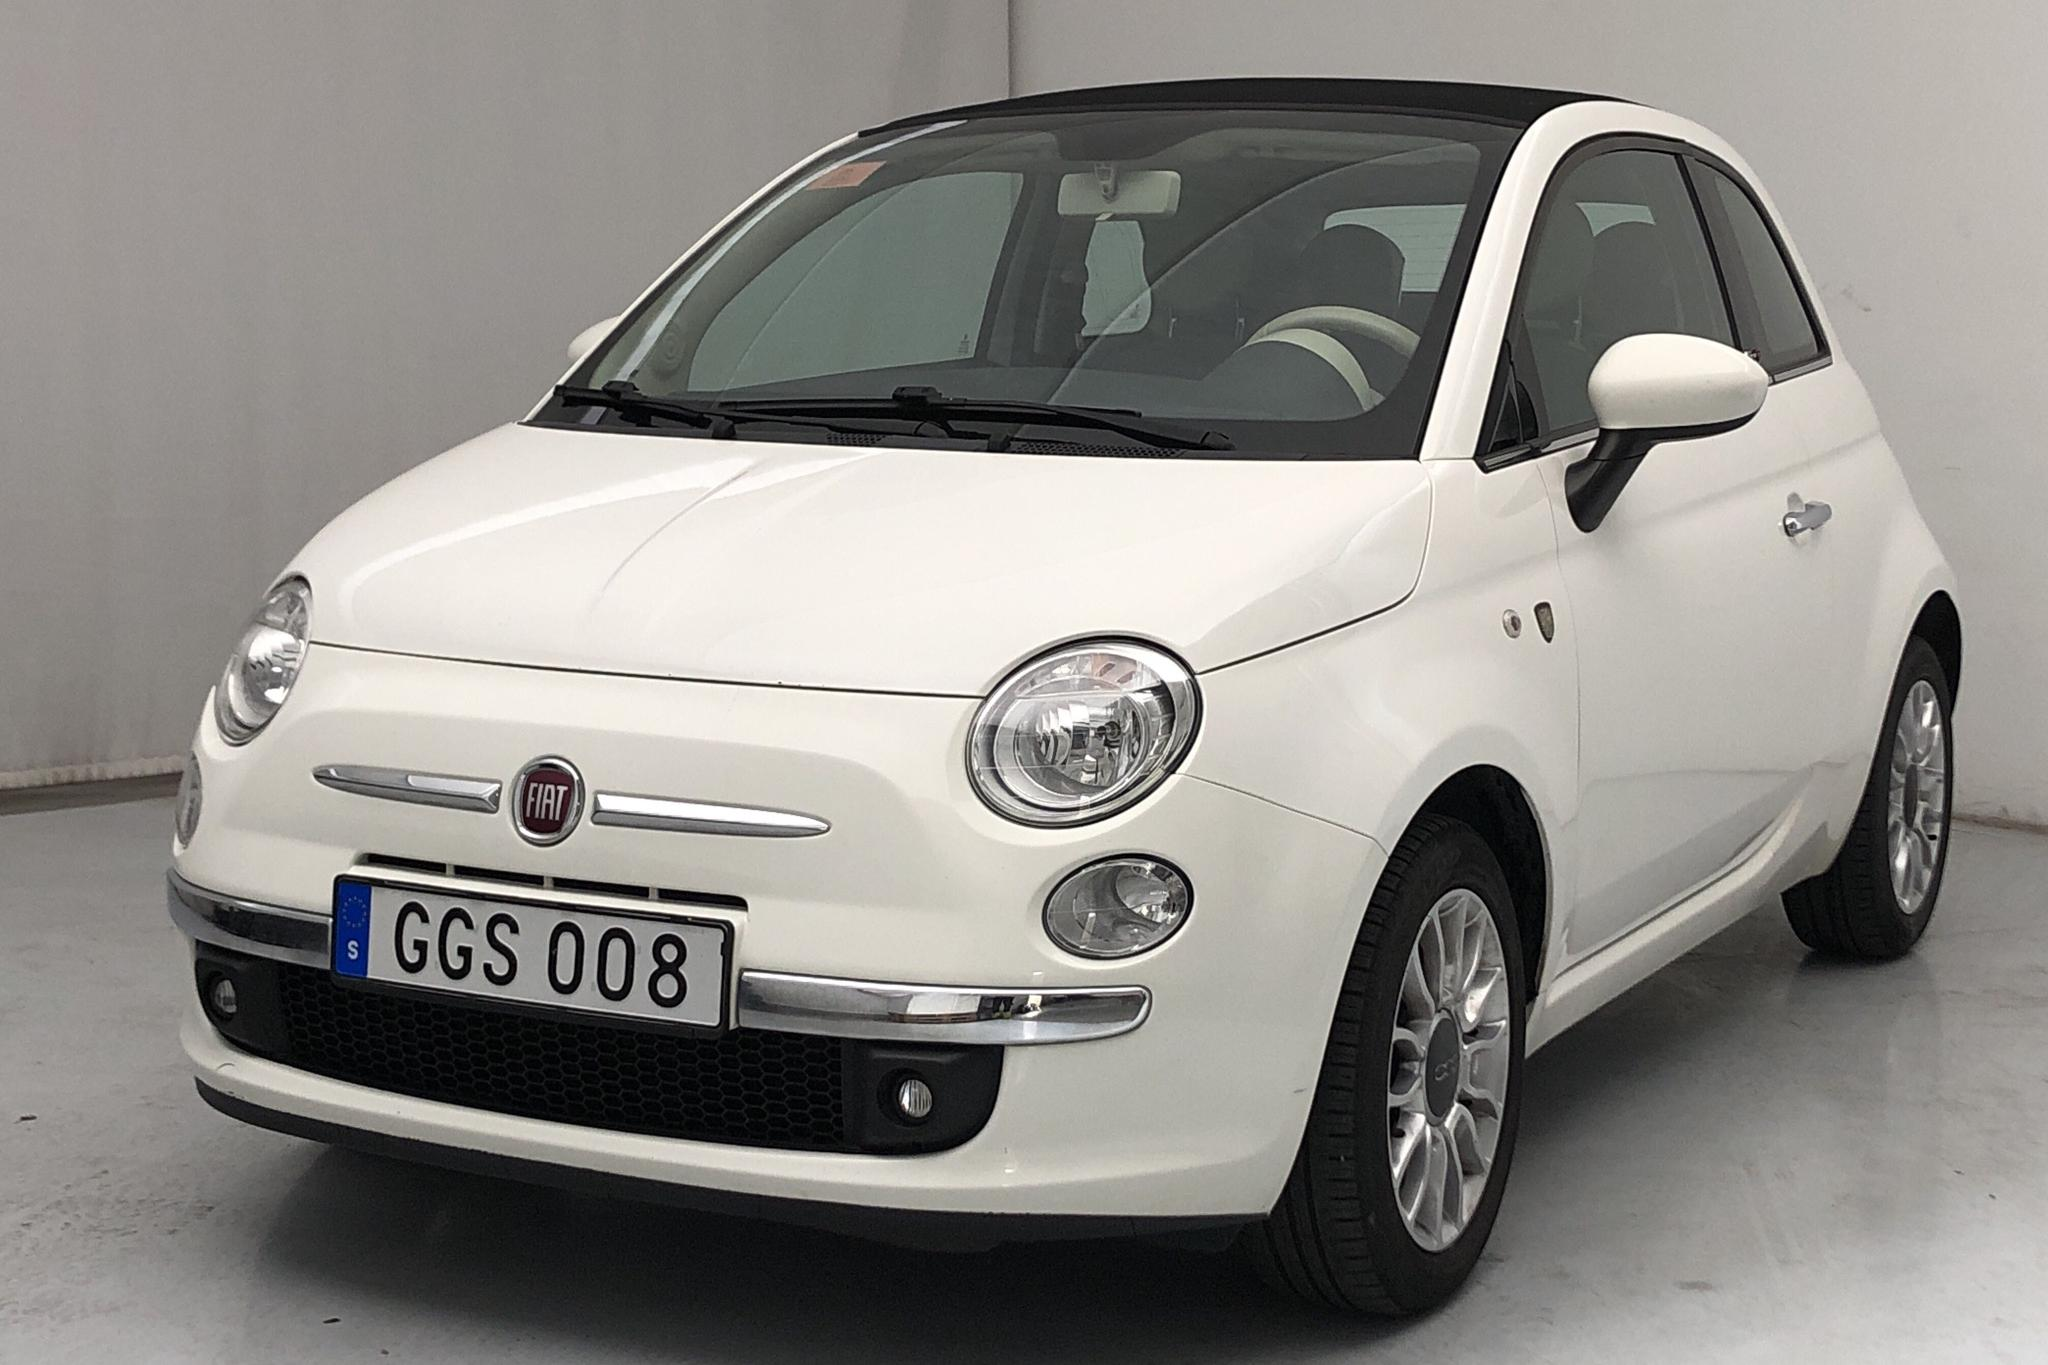 Fiat 500C 1.2 (69hk) - 95 430 km - Manual - white - 2014